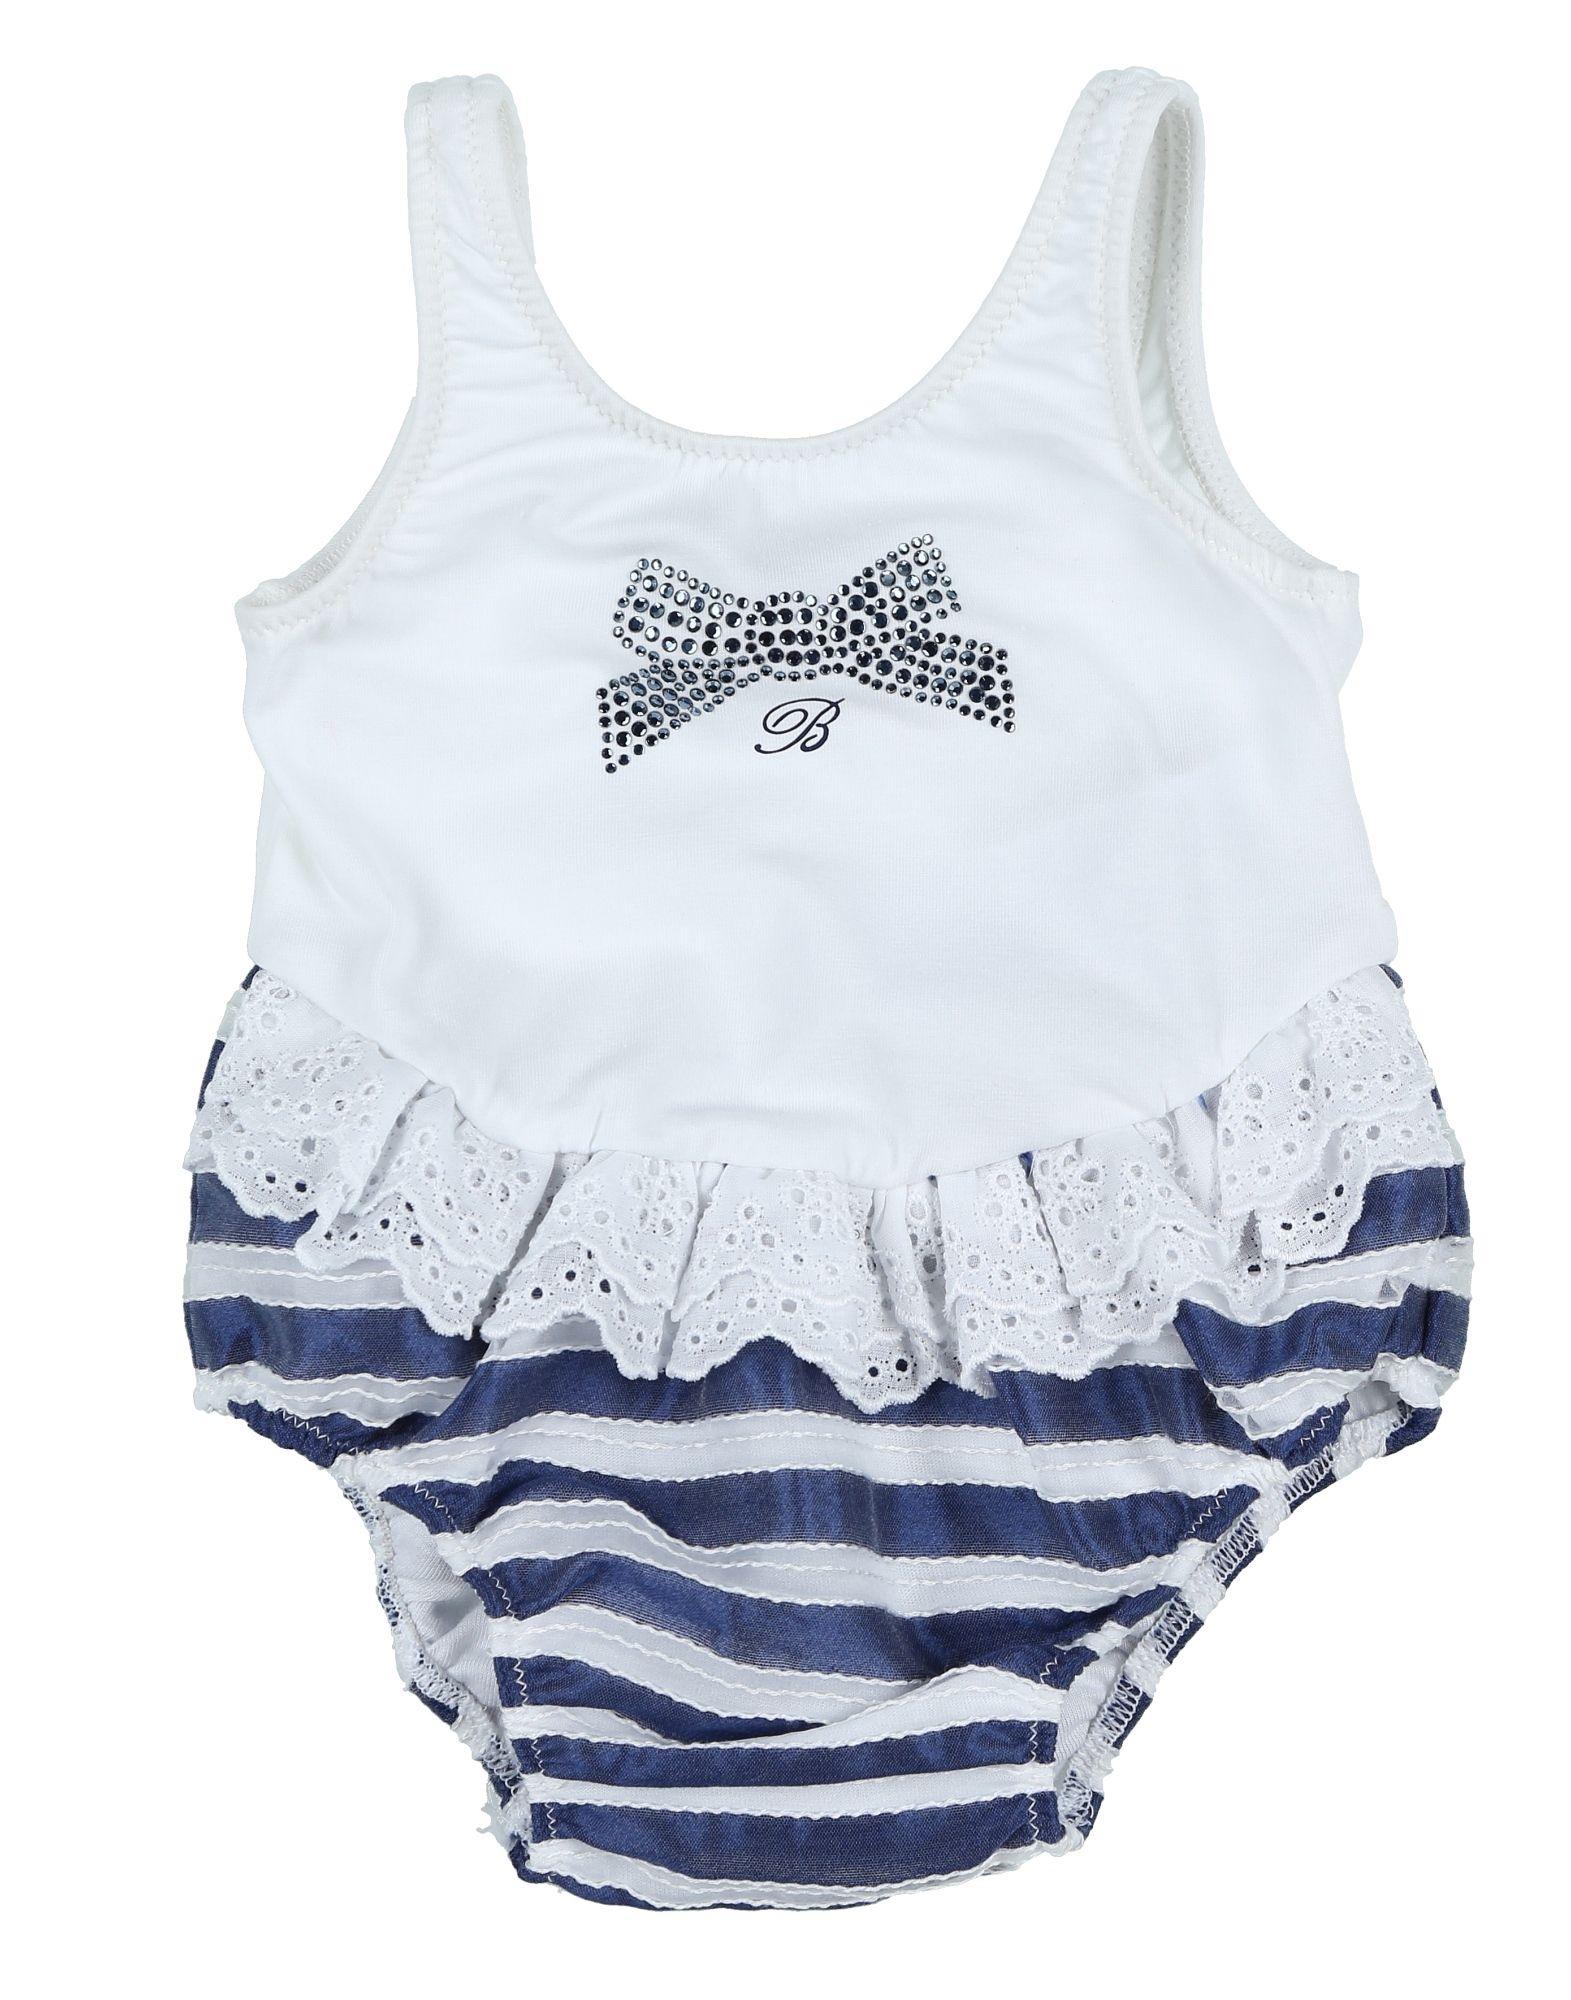 MISS BLUMARINE Слитный купальник blugirl blumarine beachwear слитный купальник